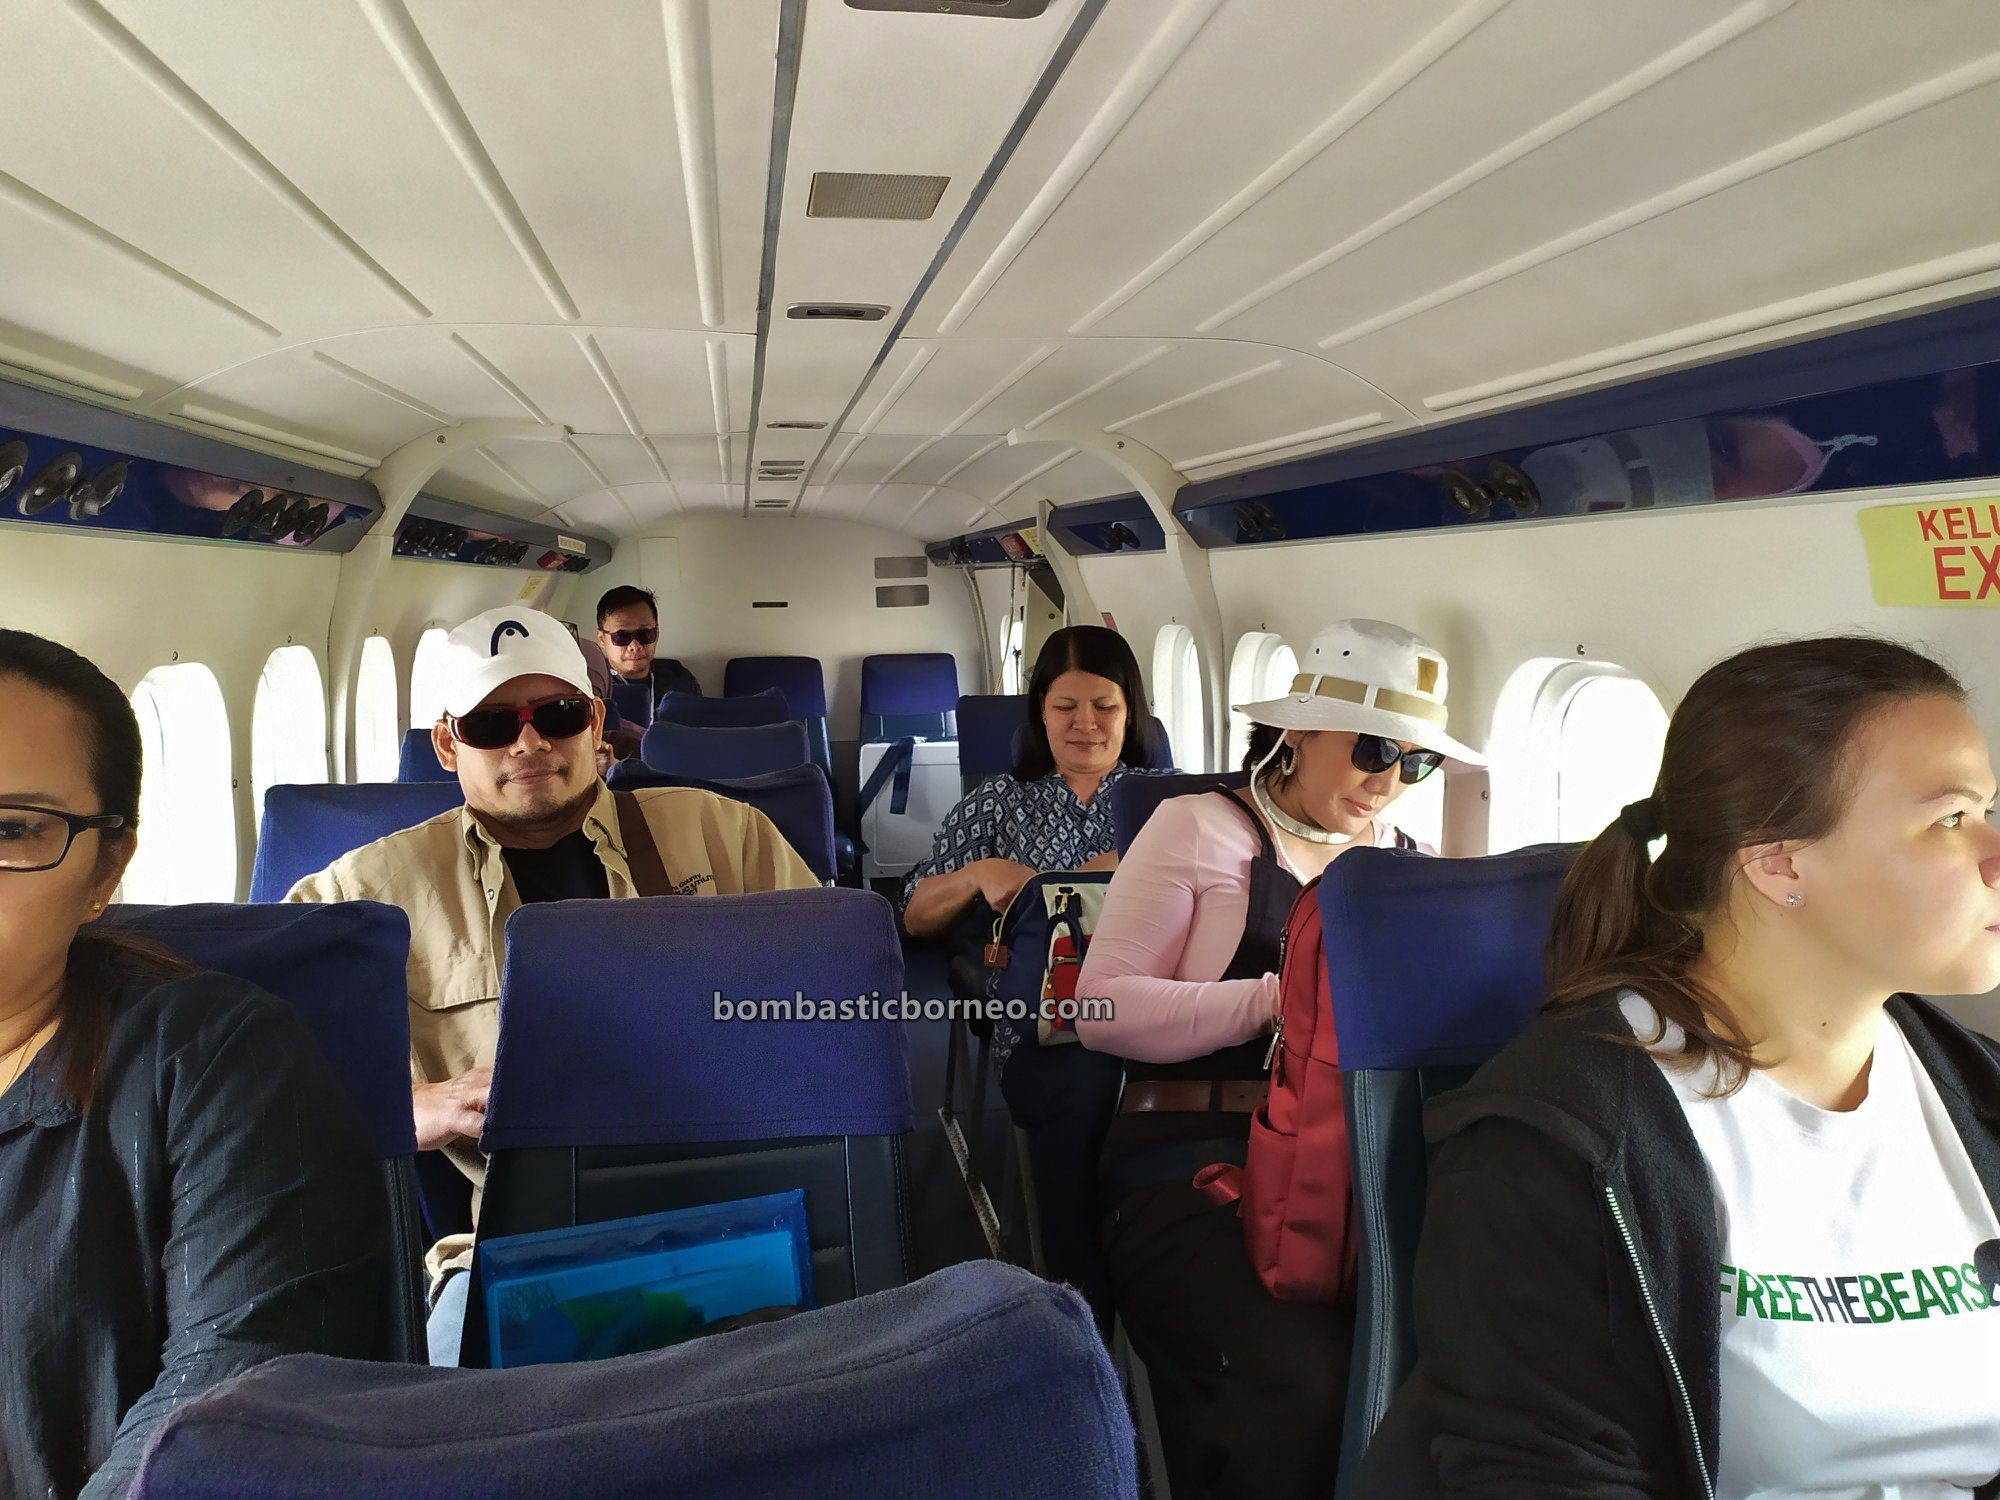 backpackers, destination, exploration, Interior, village, Maligan Highlands, Lawas, Limbang, Lun Bawang, native, Tourism, Travel Guide, Borneo, 跨境婆罗洲游踪, 砂拉越内陆高原,